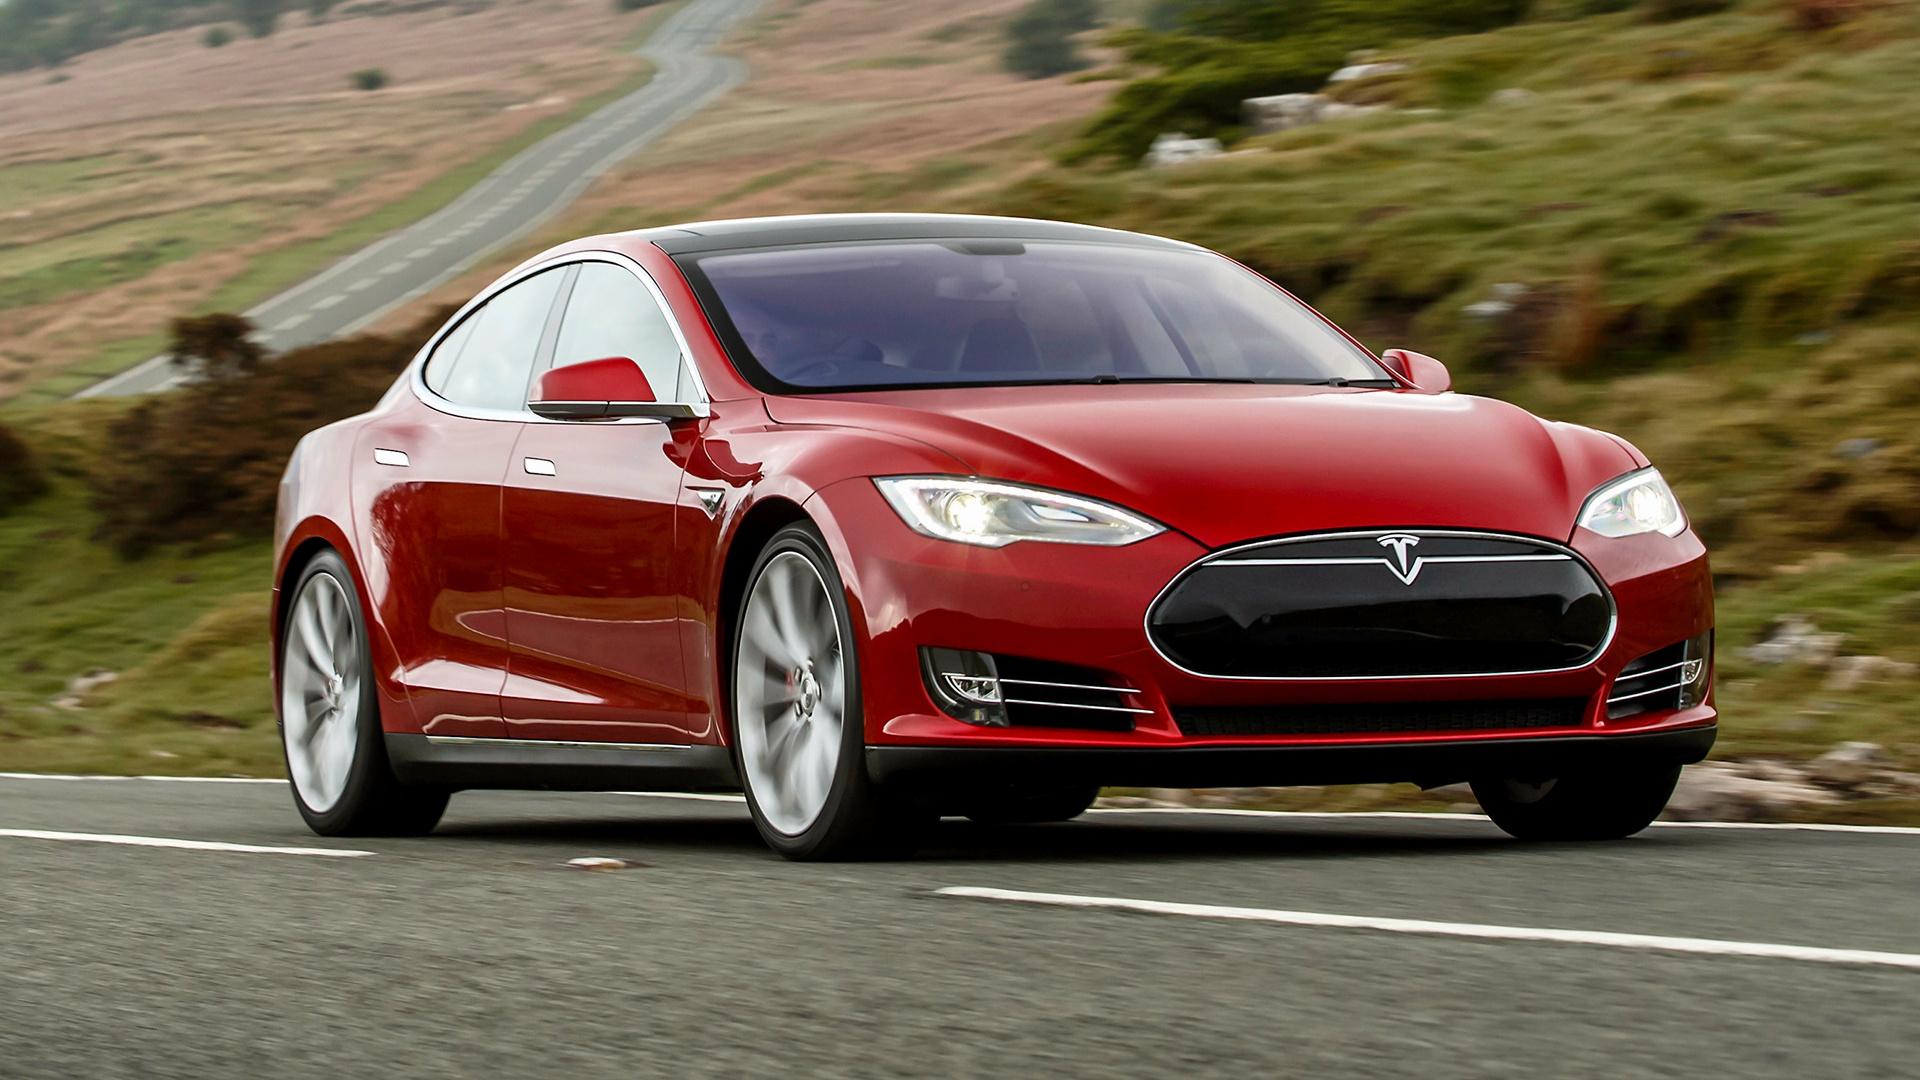 2014 Tesla Model S P85 Uk Wallpapers And Hd Images Car Pixel